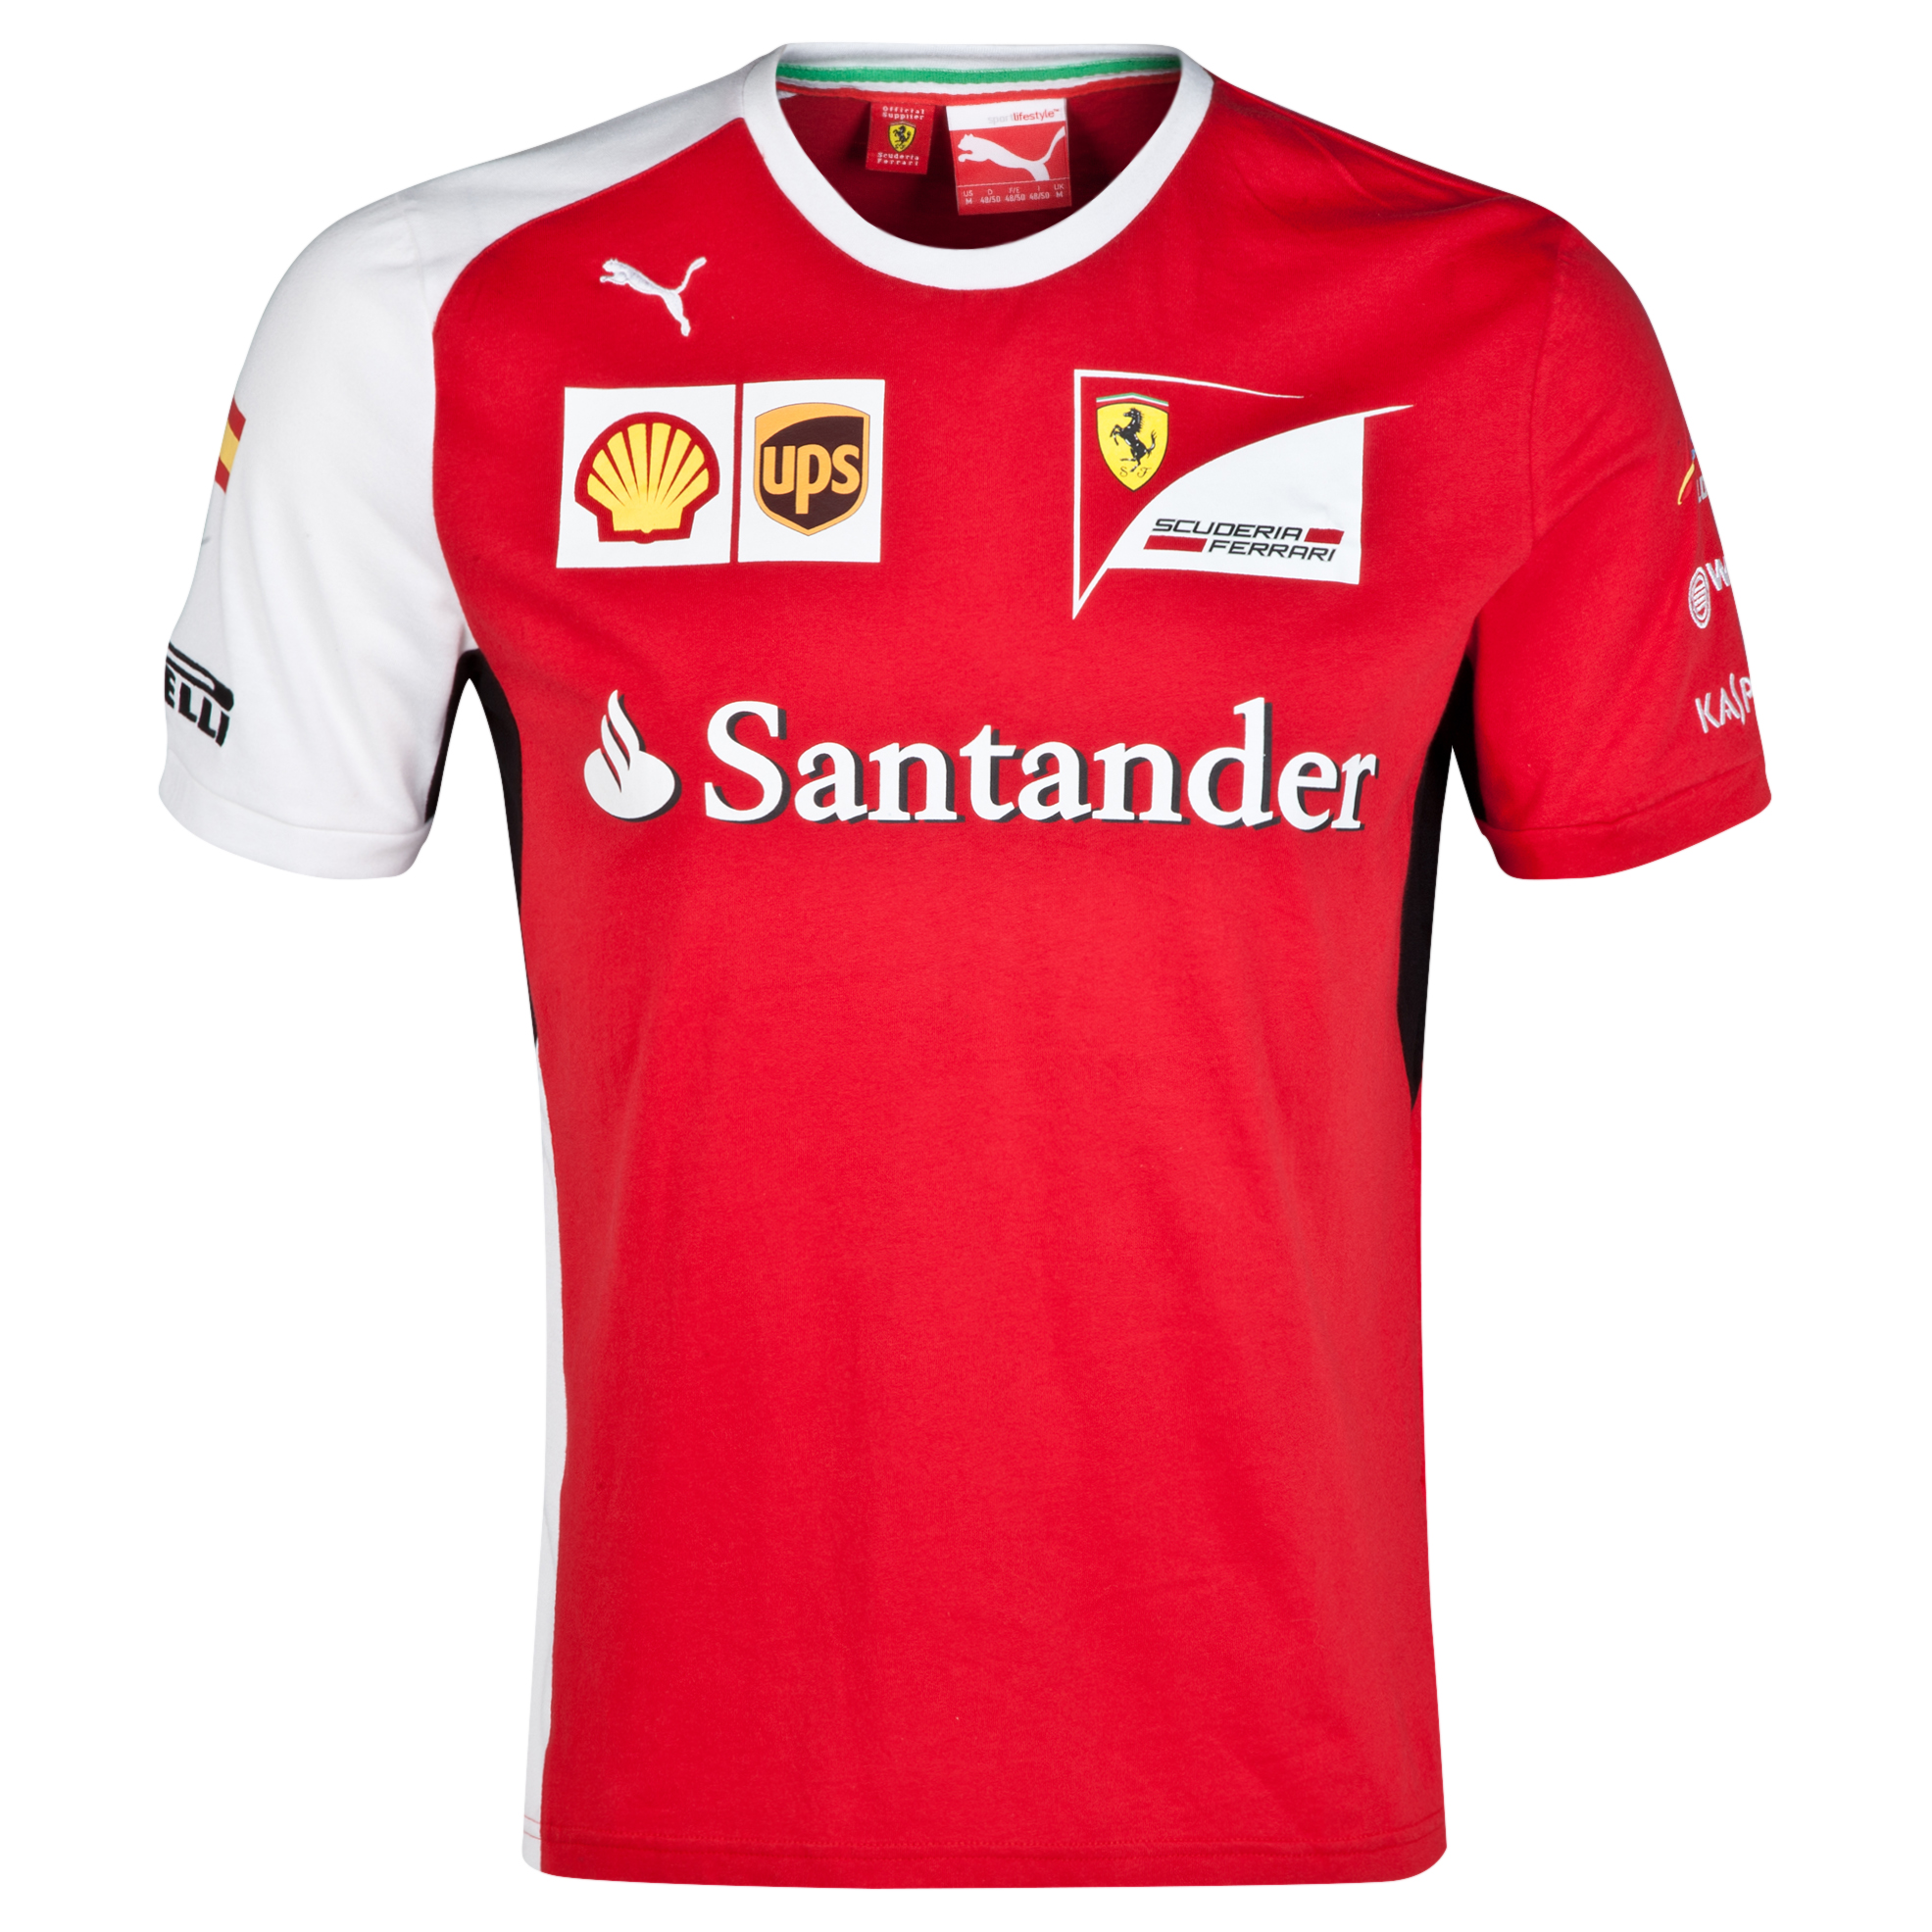 Scuderia Ferrari Alonso Driver T-Shirt